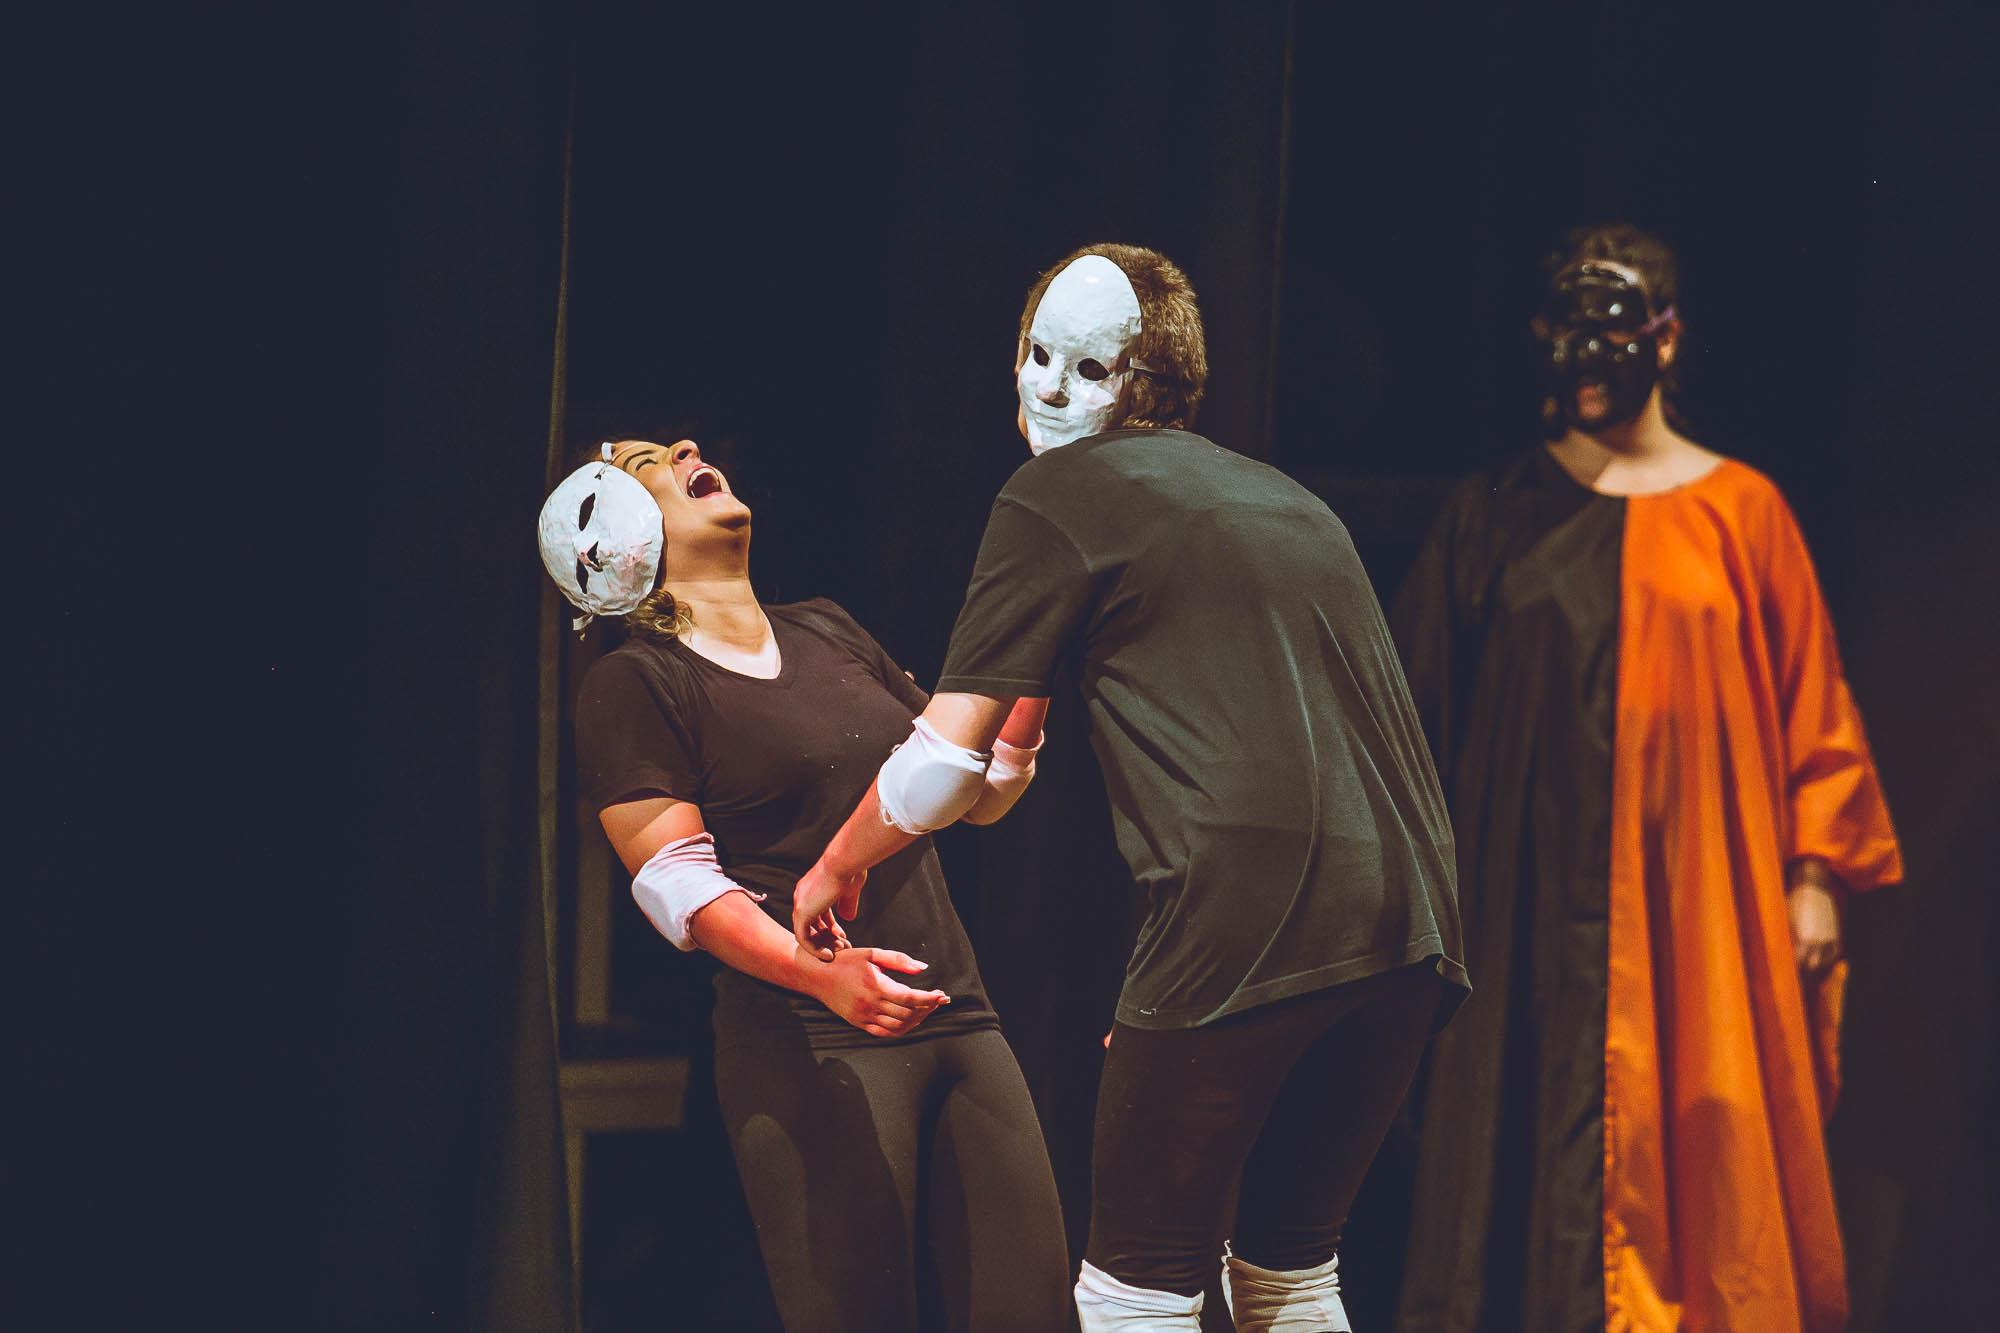 Fotos do espetáculo: Baile de Peruas ou #autoironiaatodaprova